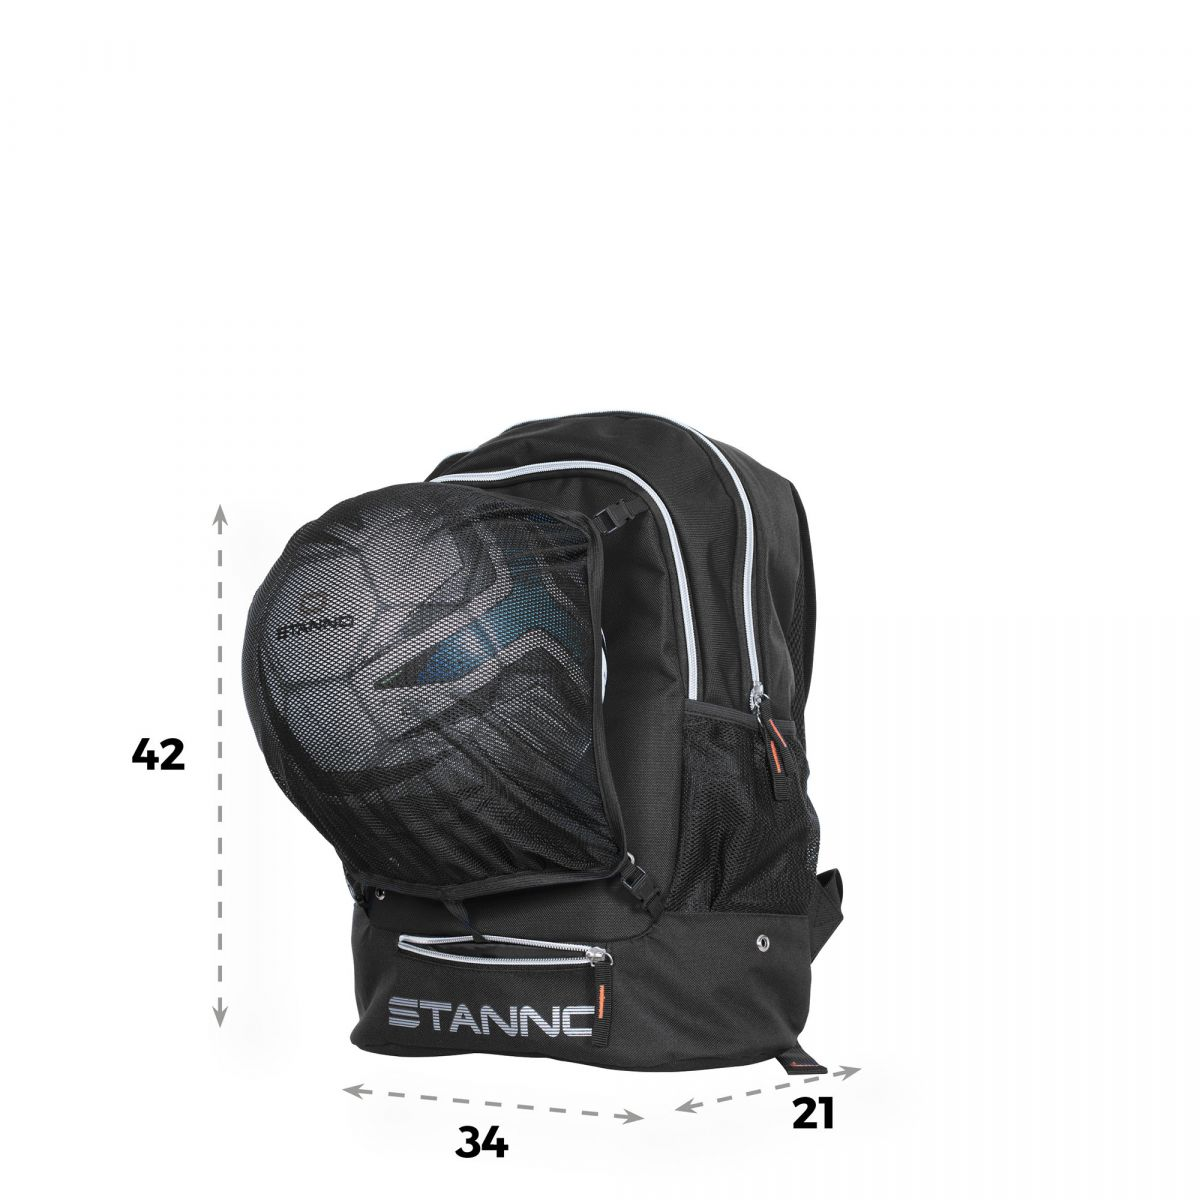 2f8329fd5e8 Stanno Backpack met ballennet Zwart, kopen? | Sportdirect.com